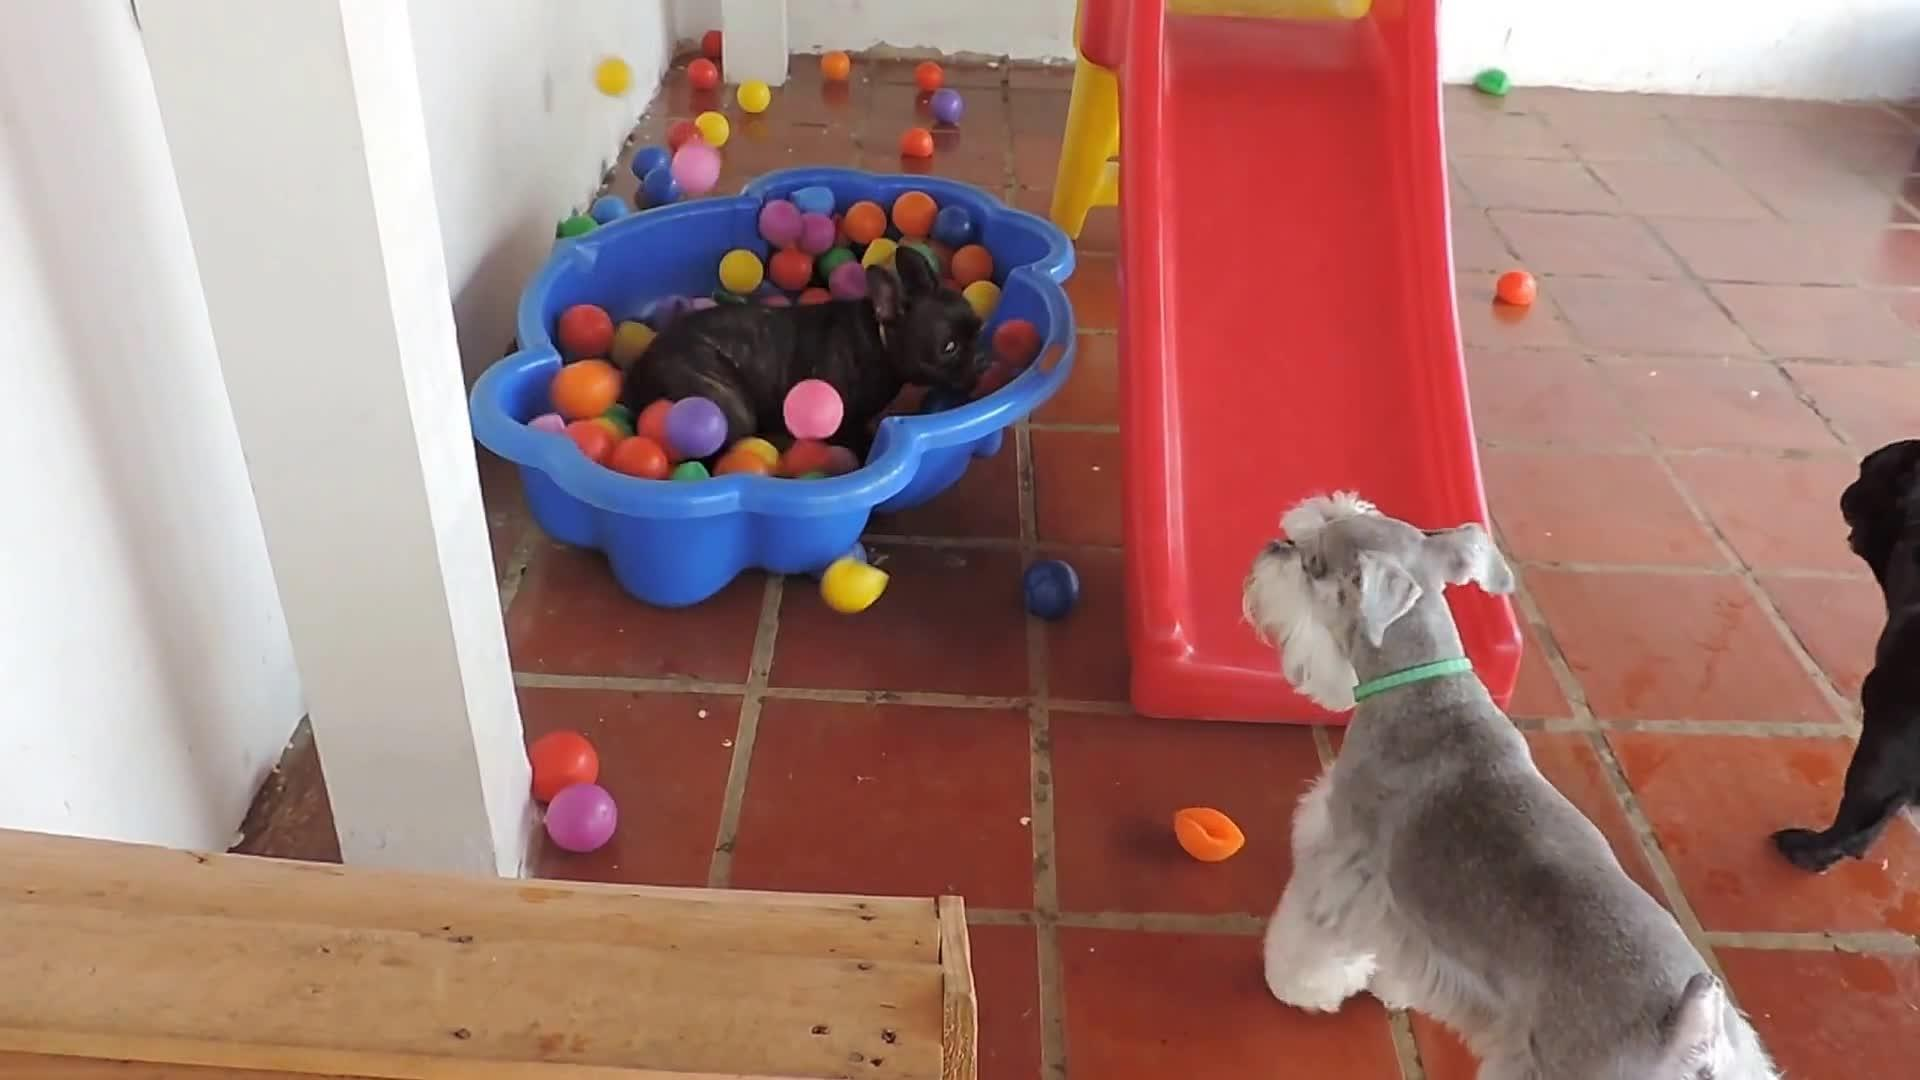 Best Bulldog Ball Adorable Dog - thumbnail-1469770646096  Photograph_32525  .jpg